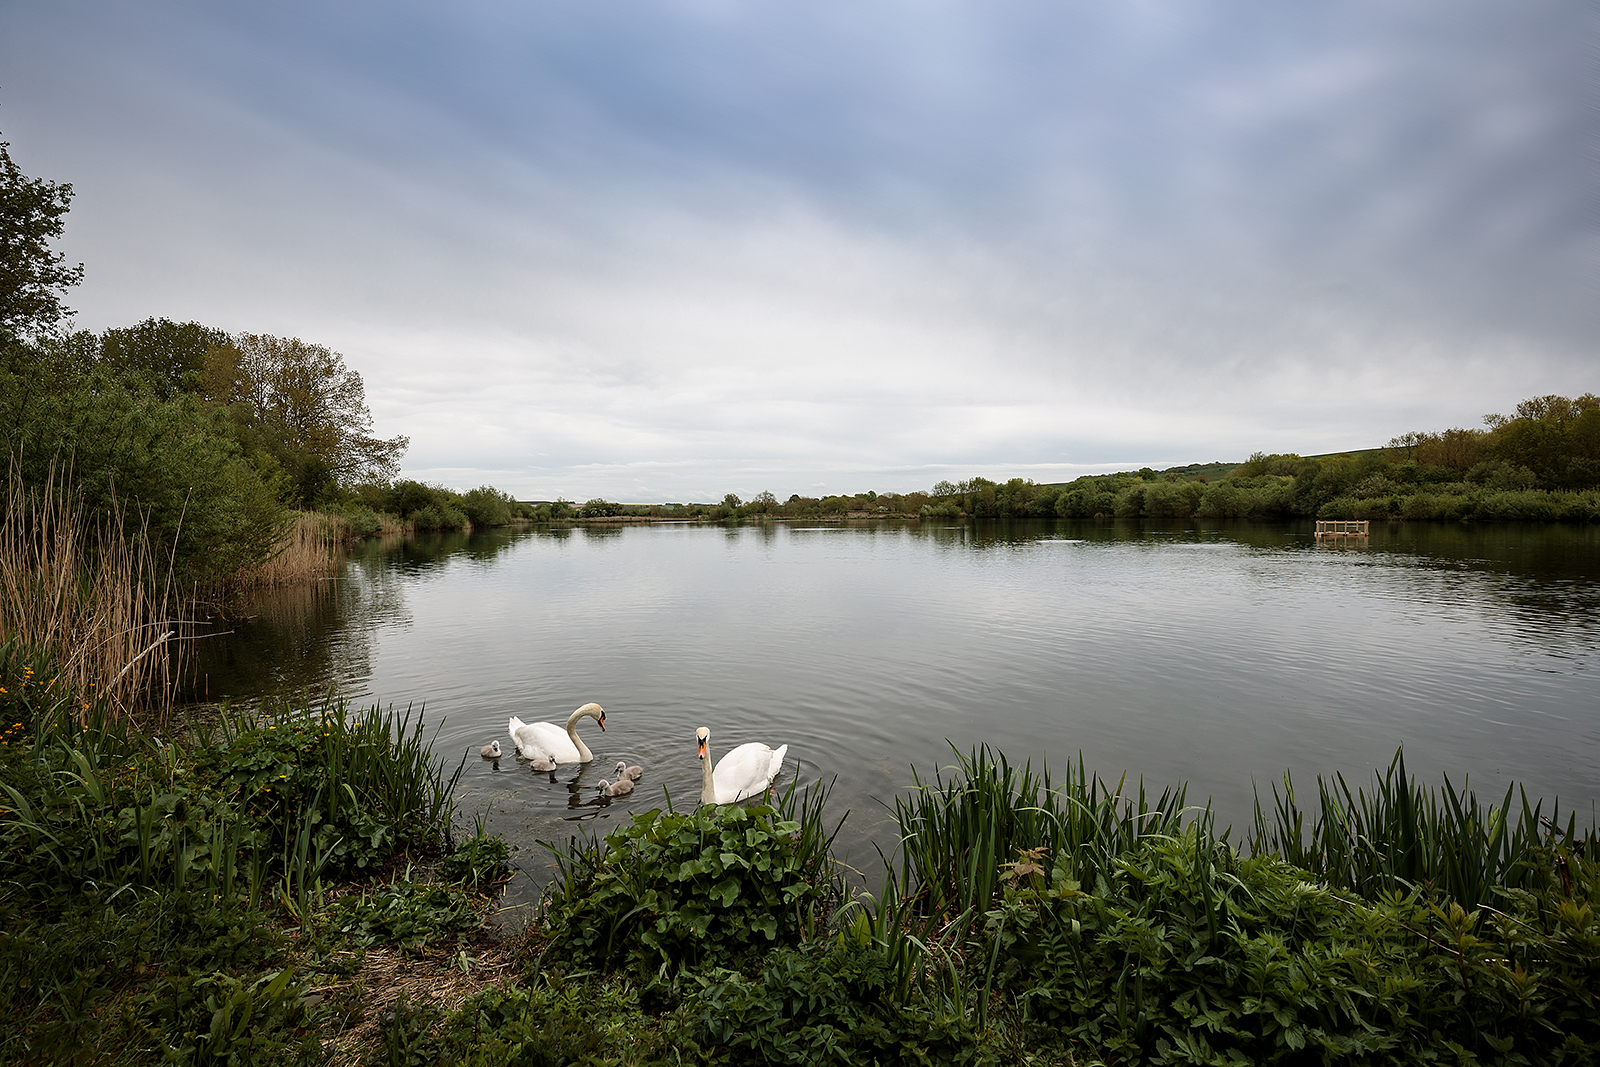 'Langford Lakes' by Shaun Duke